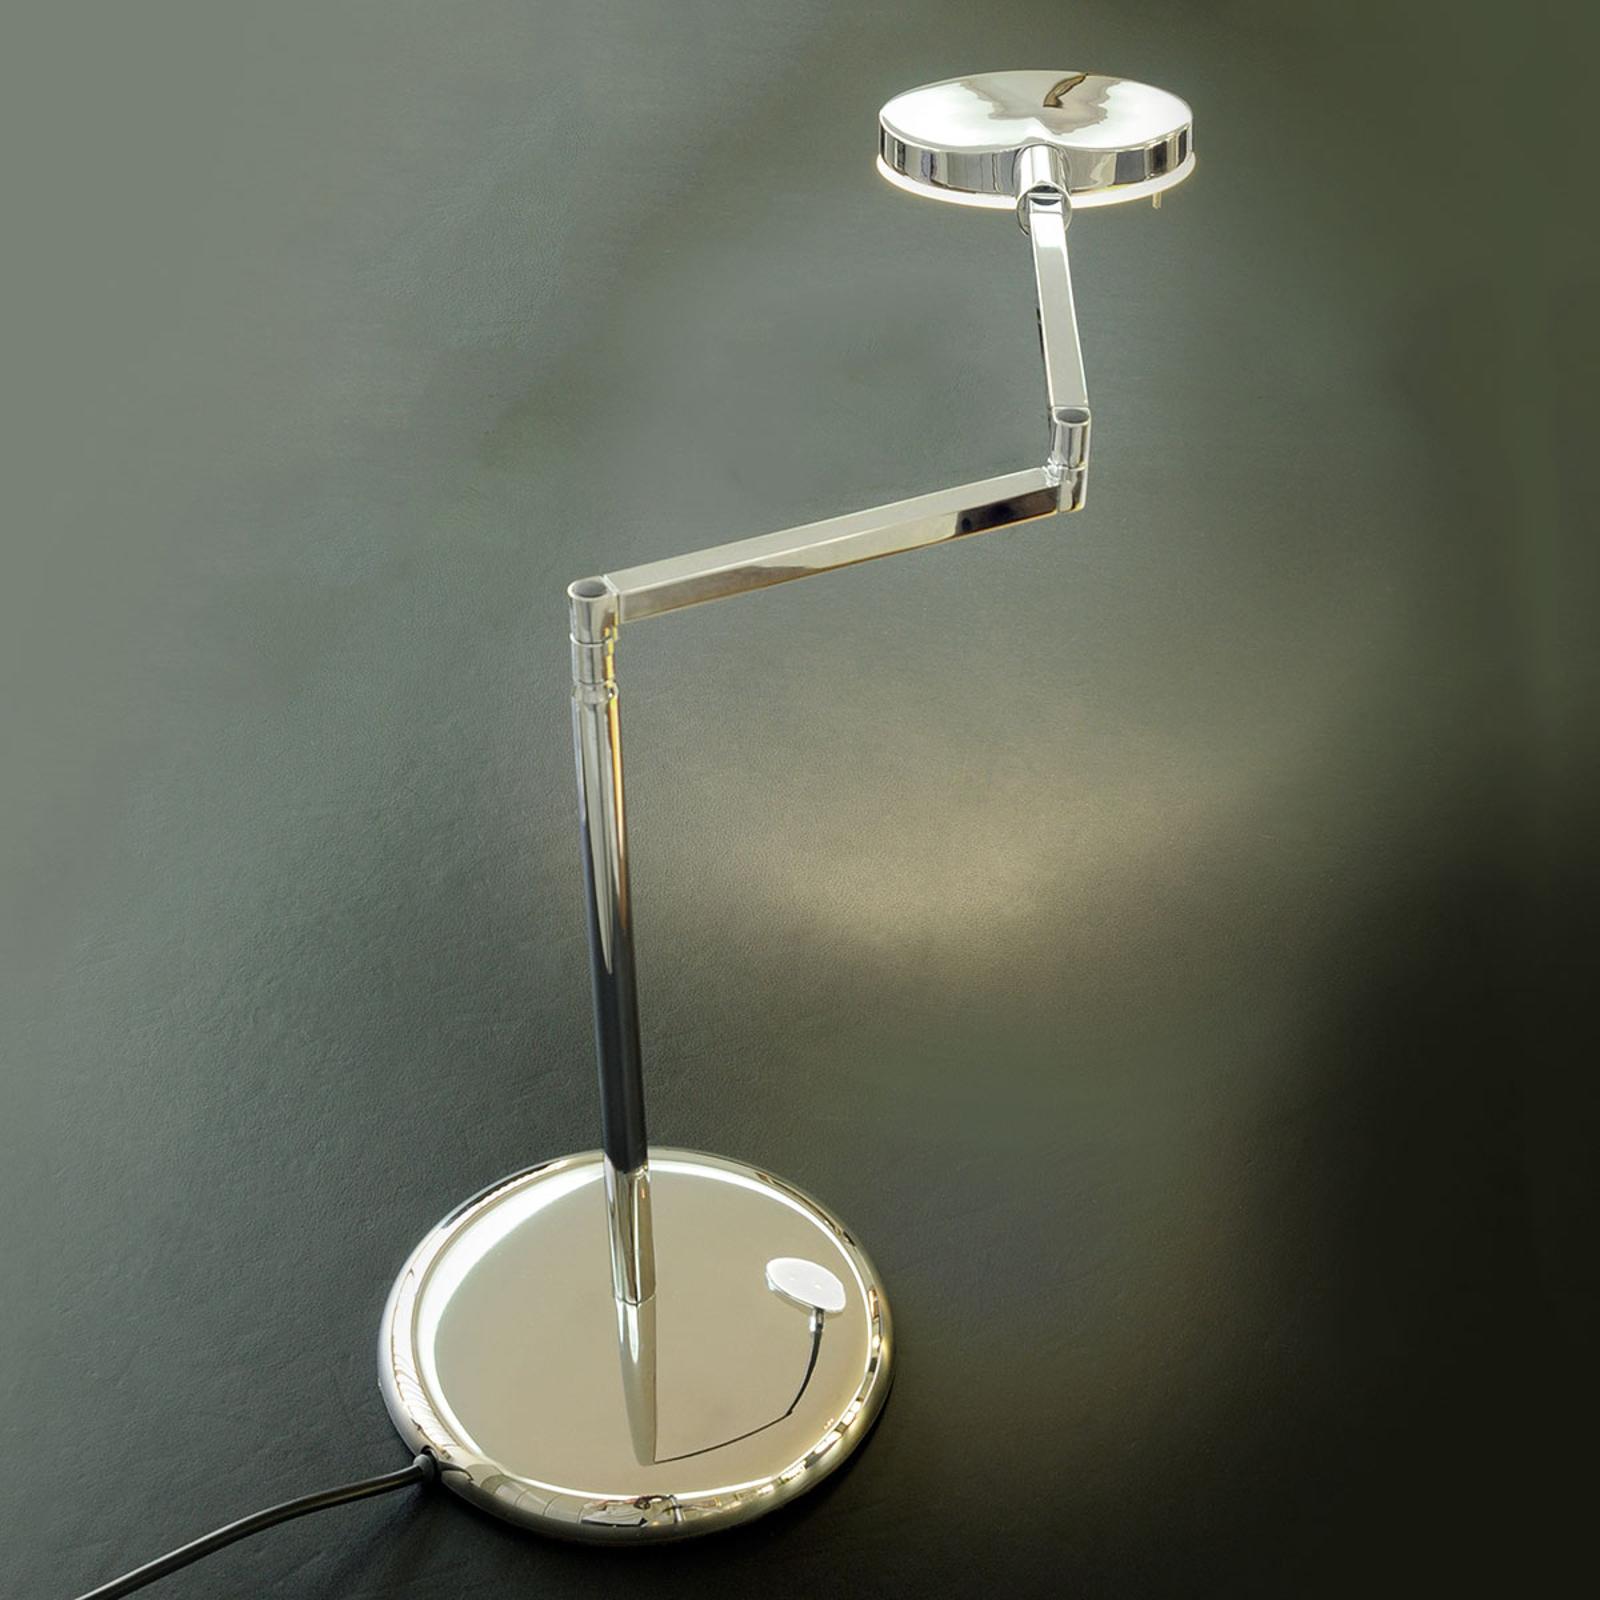 Milan 3-LED flexibele LED bureaulamp